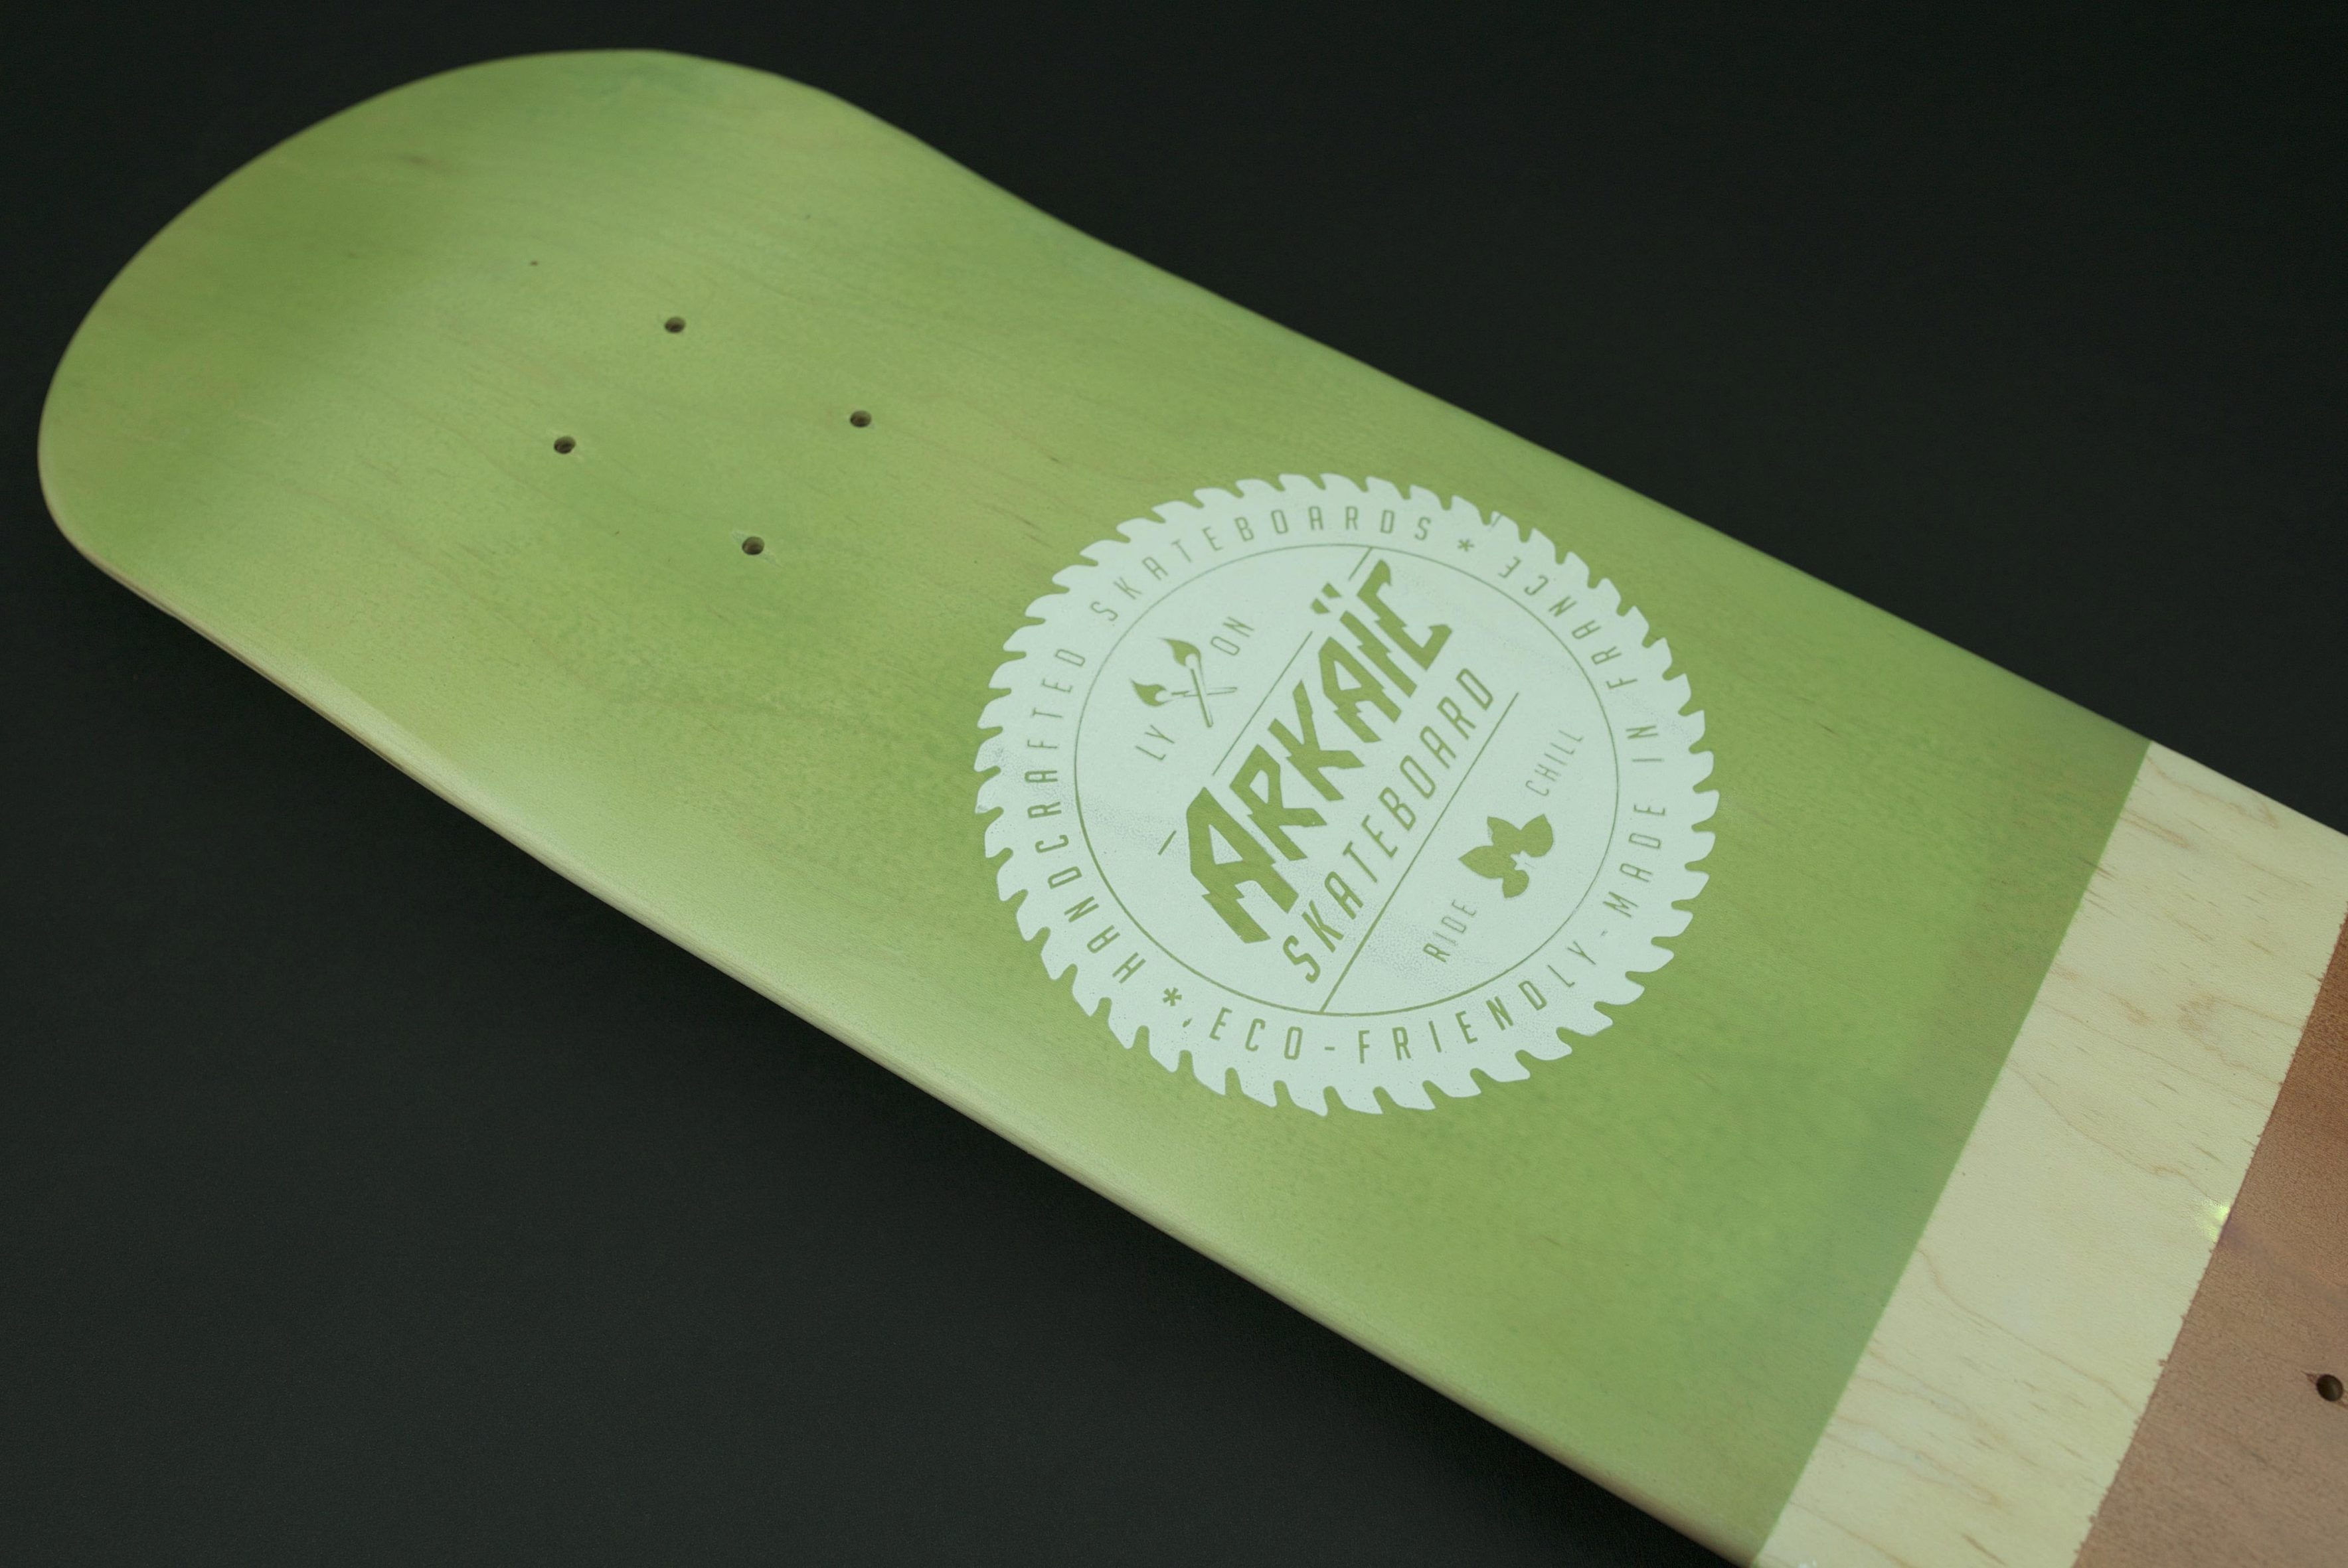 "Classical L 8,1"" SkateShop Lyon Street Arkaic Skateboard"